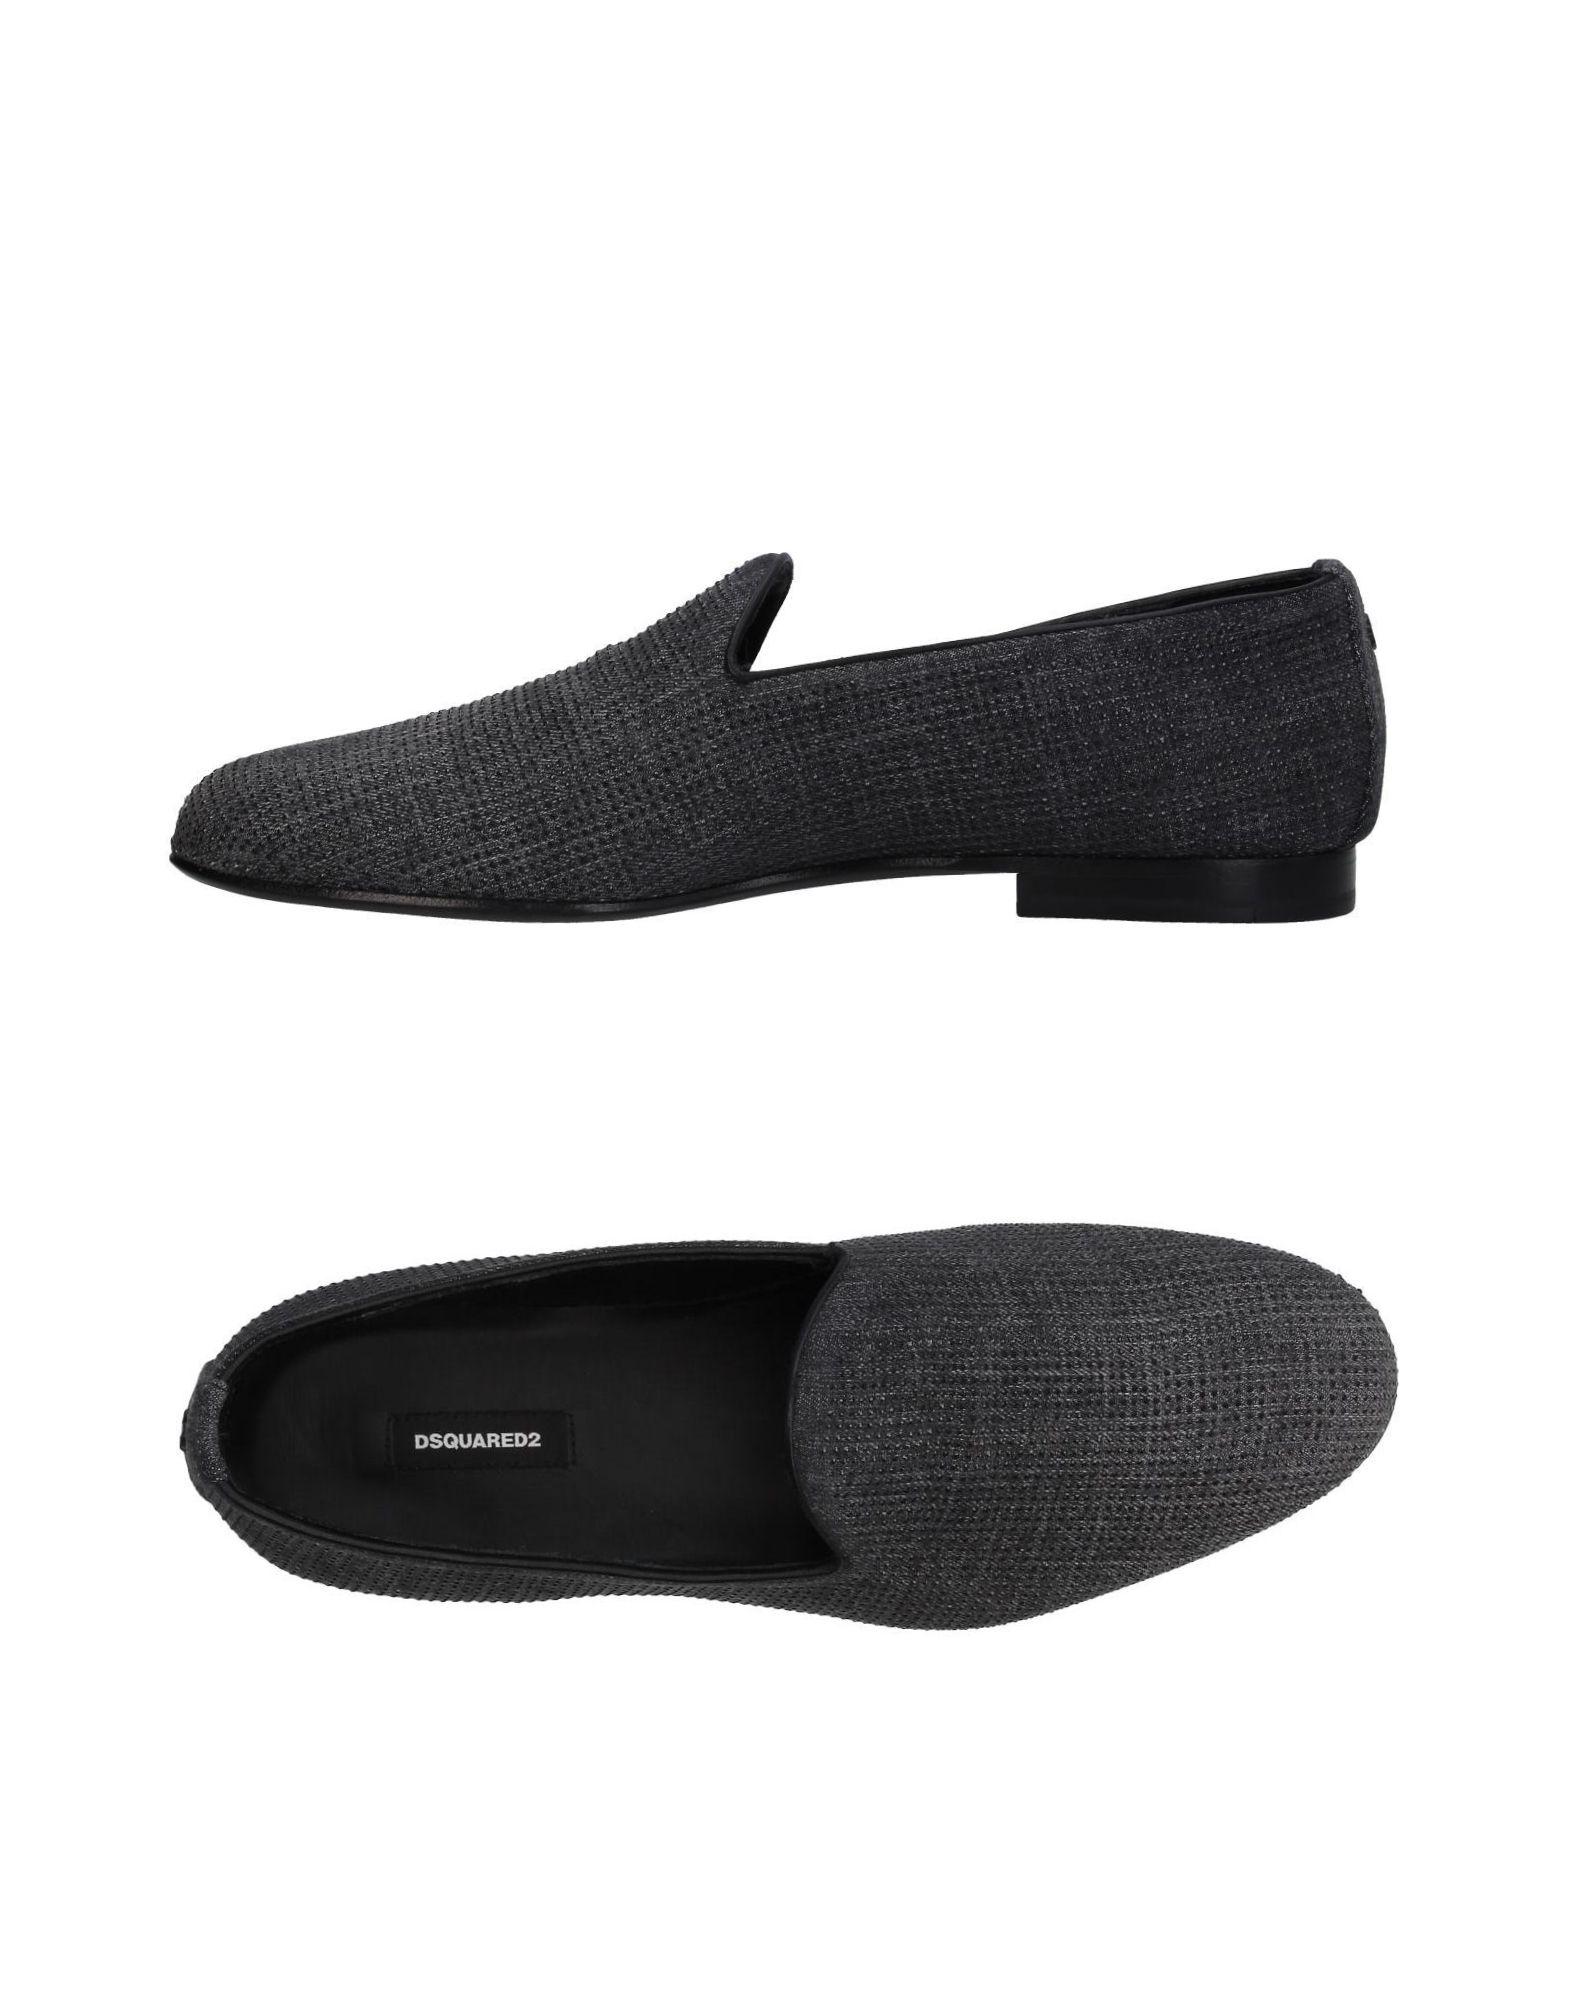 Dsquared2 Mokassins Herren  11409391ED Gute Qualität beliebte Schuhe